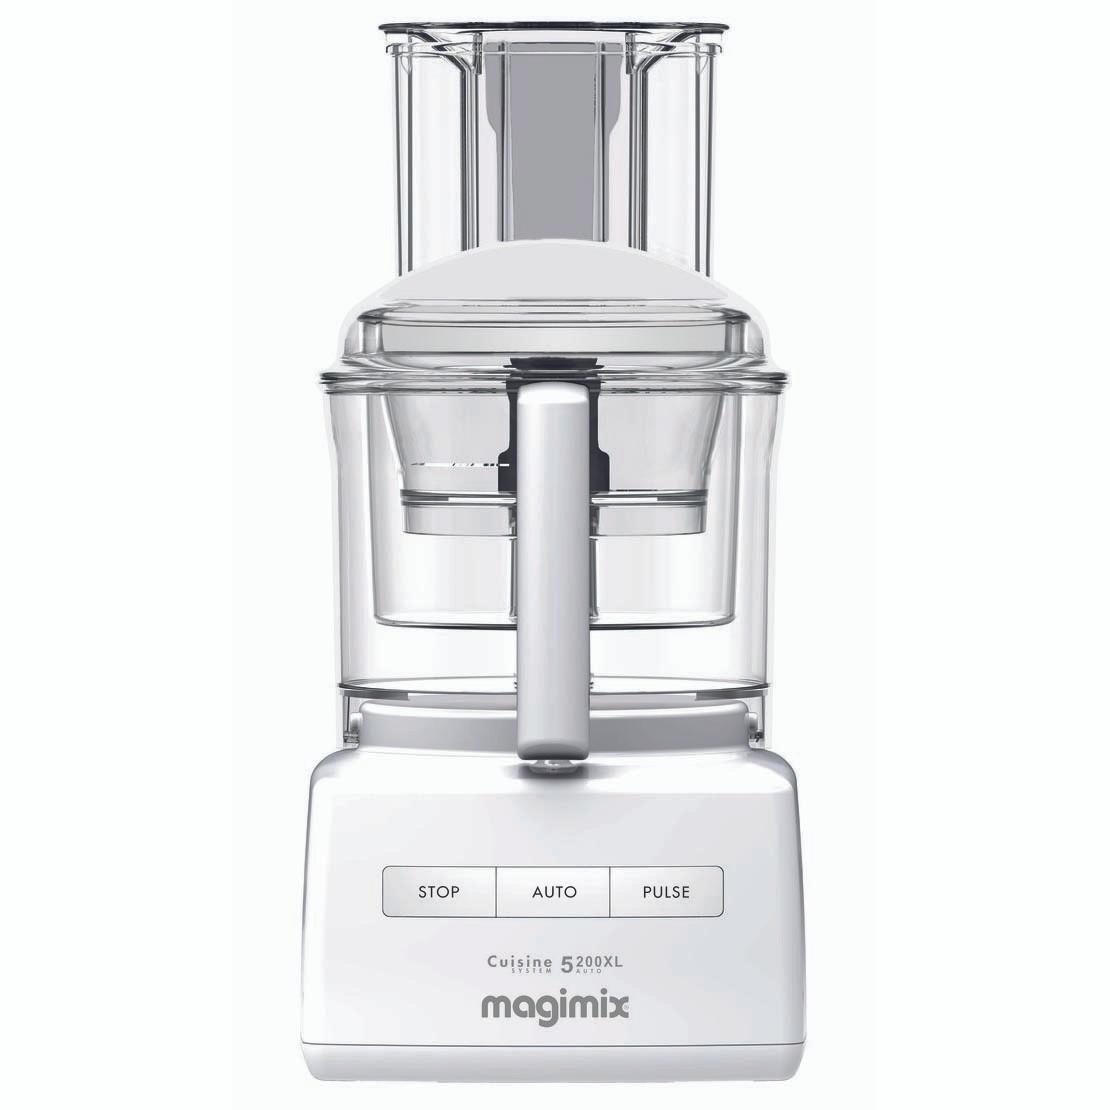 magimix 5200 xl premium in white. Black Bedroom Furniture Sets. Home Design Ideas